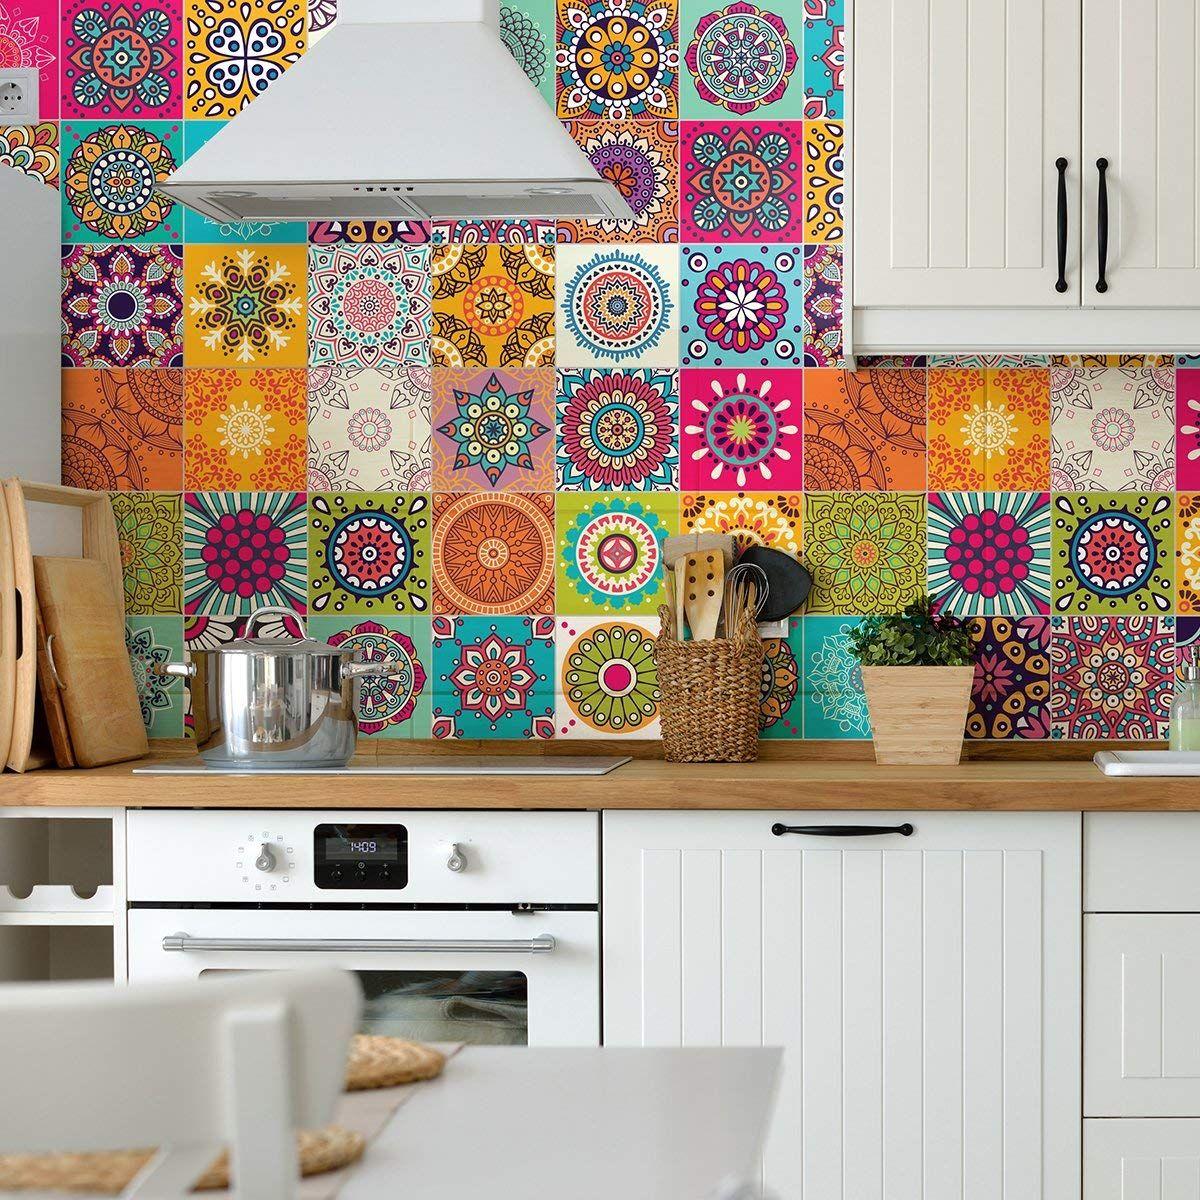 Ambiance Live Karo Zement Wandtattoo Azulejos 15 X 15 Cm 60 Teilig Amazon De Kuche Haushalt Wandtattoo Mosaik Wandfliesen Badezimmer Gestalten